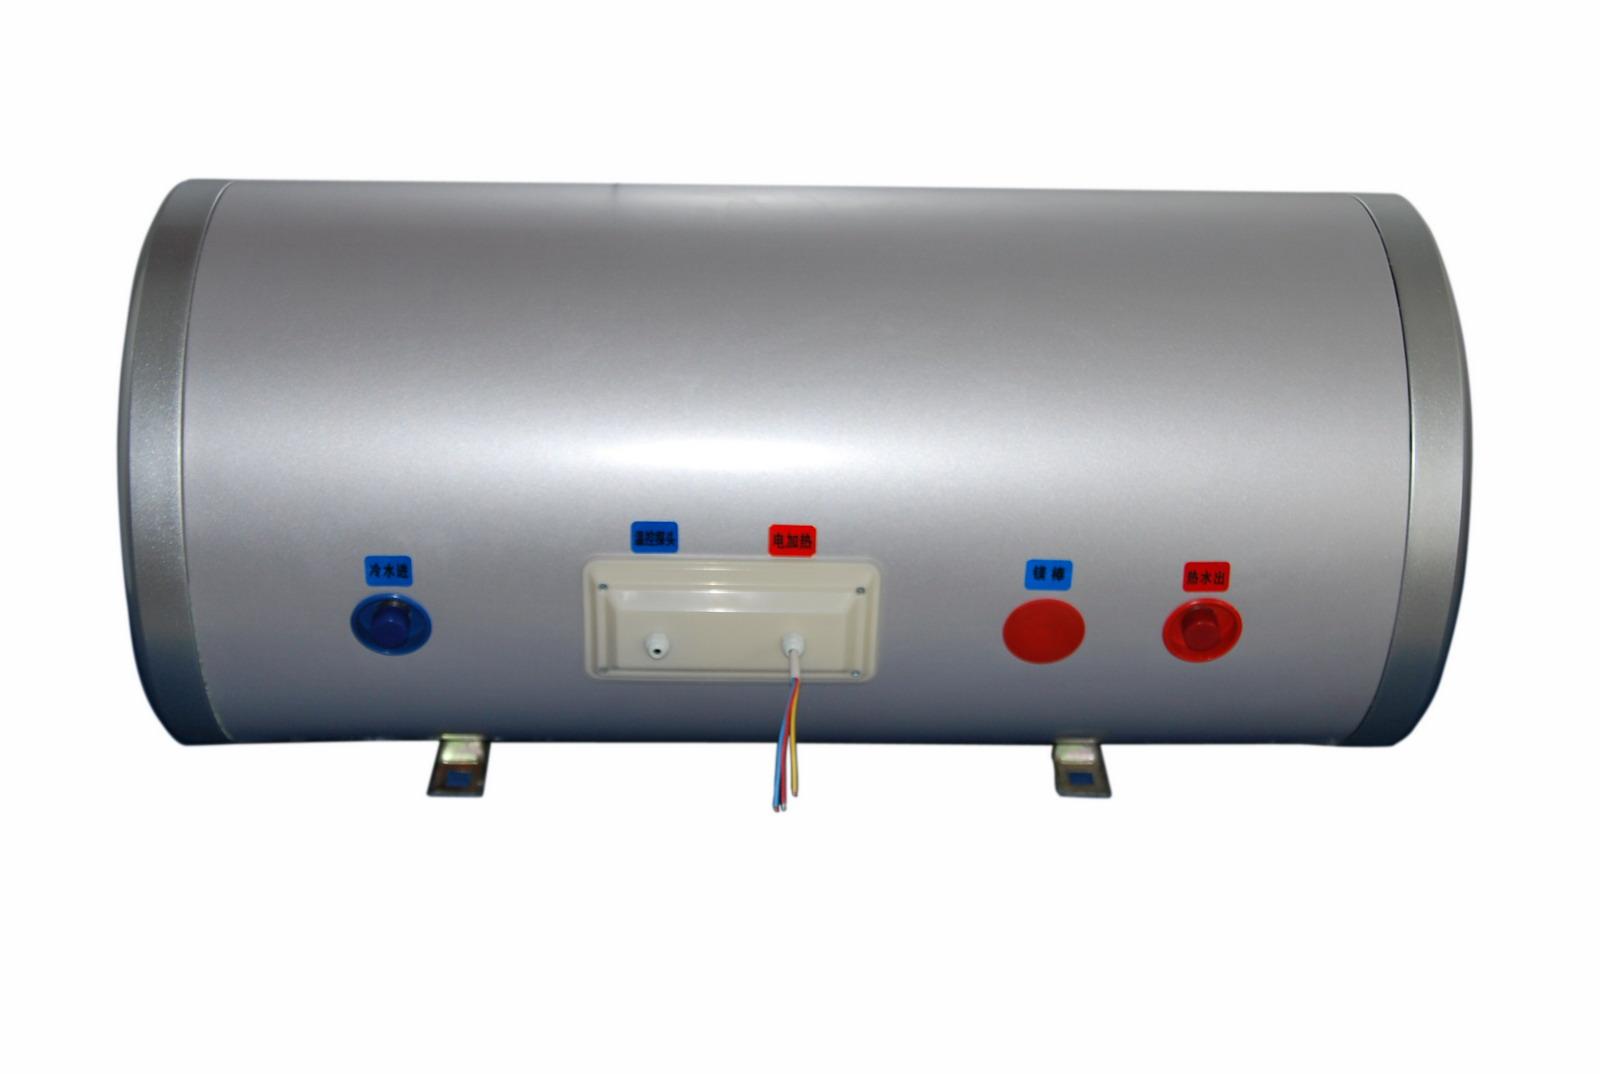 sc 1 st  Jiangsu Sunpower Solar Technology Co. Ltd & Horizontal Hot Water Tank